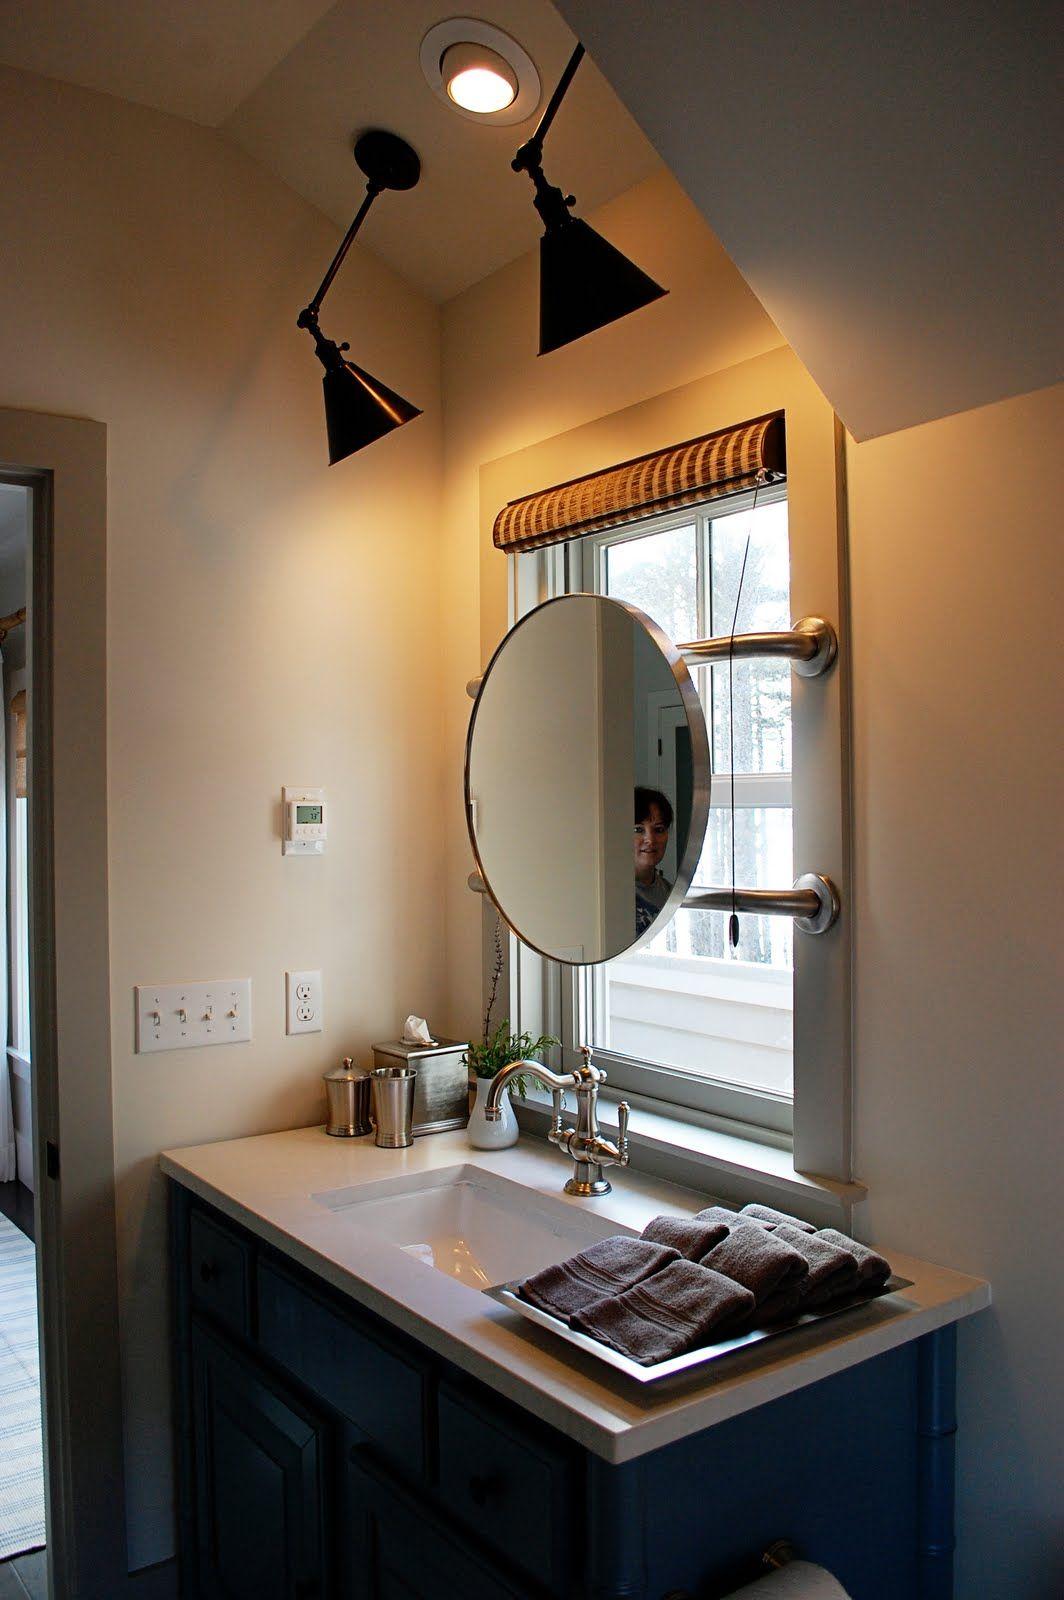 Will Work For Decor Small Bathroom Window Bathroom Mirror Small Bathroom Sinks